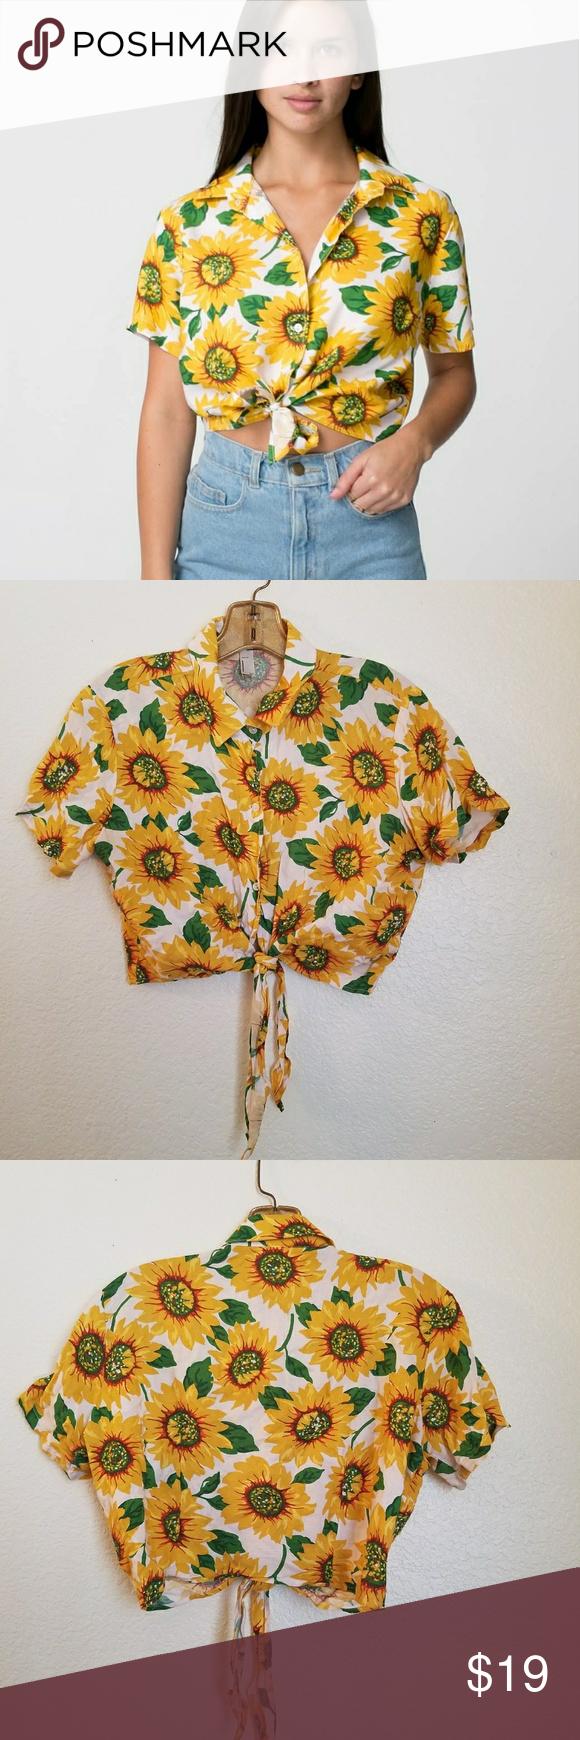 American Apparel sunflower shirt | American apparel ...